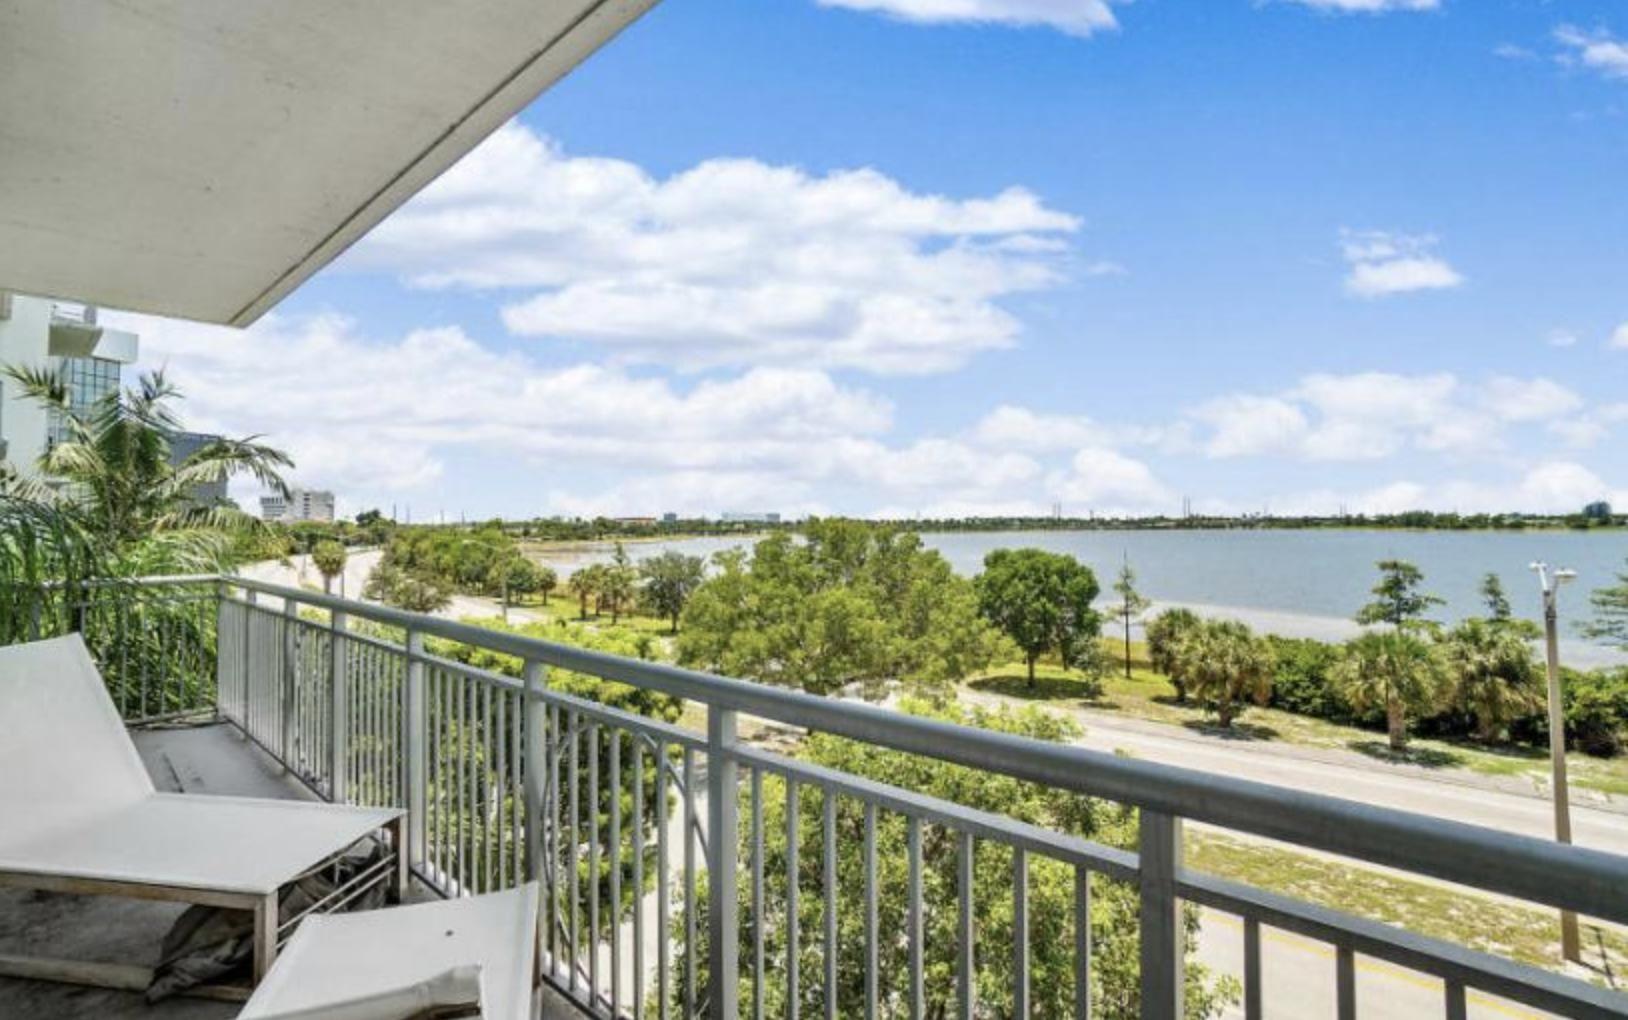 300 S Australian Avenue #313, West Palm Beach, FL 33401 - #: RX-10641765